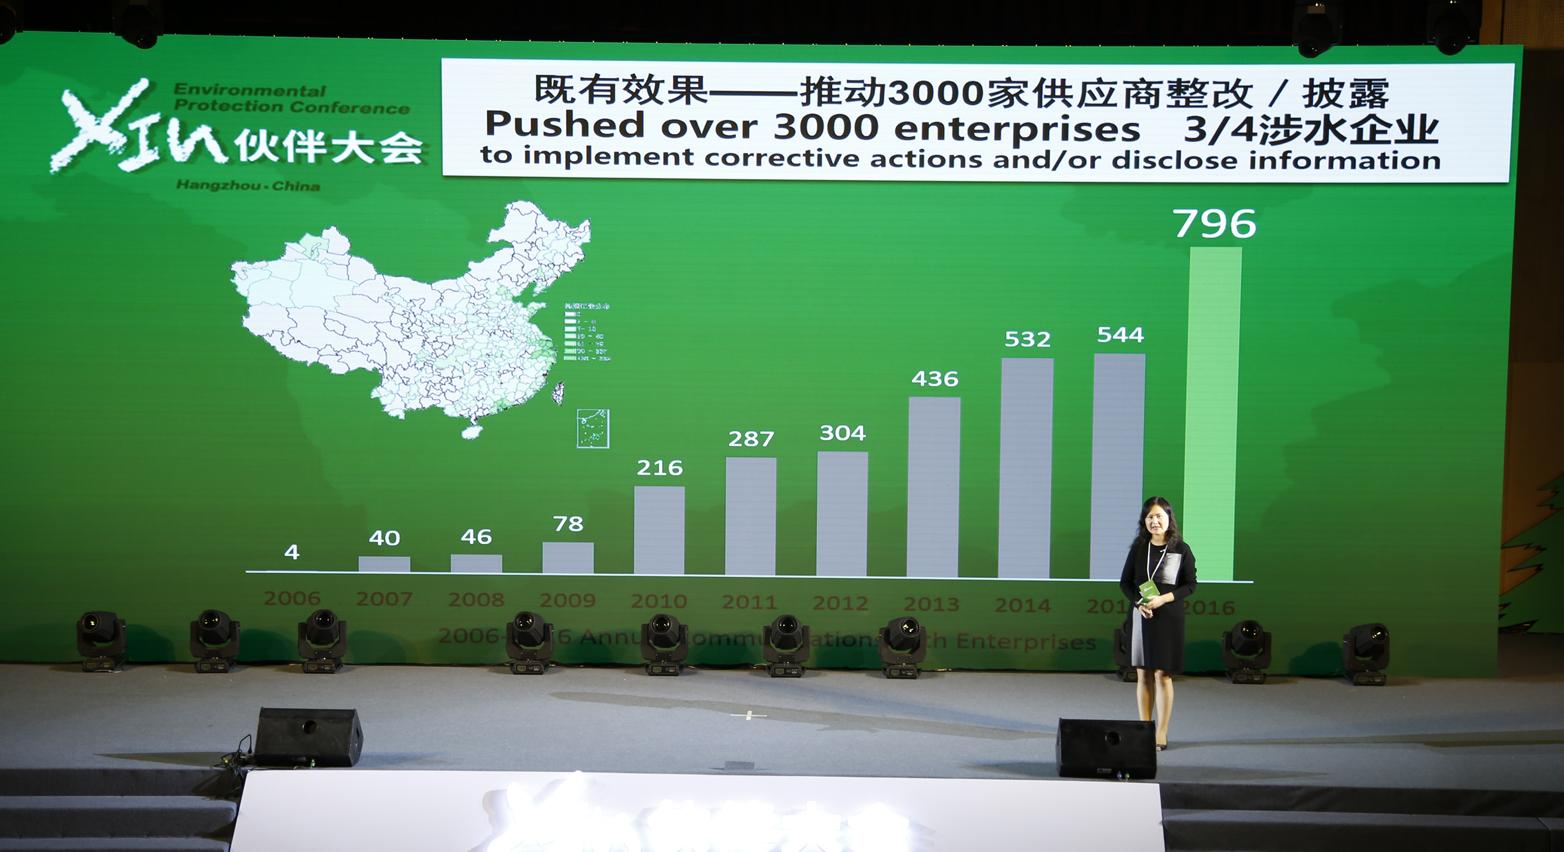 "XIN伙伴""公众环境研究中心""副主任王晶晶分享.jpg"